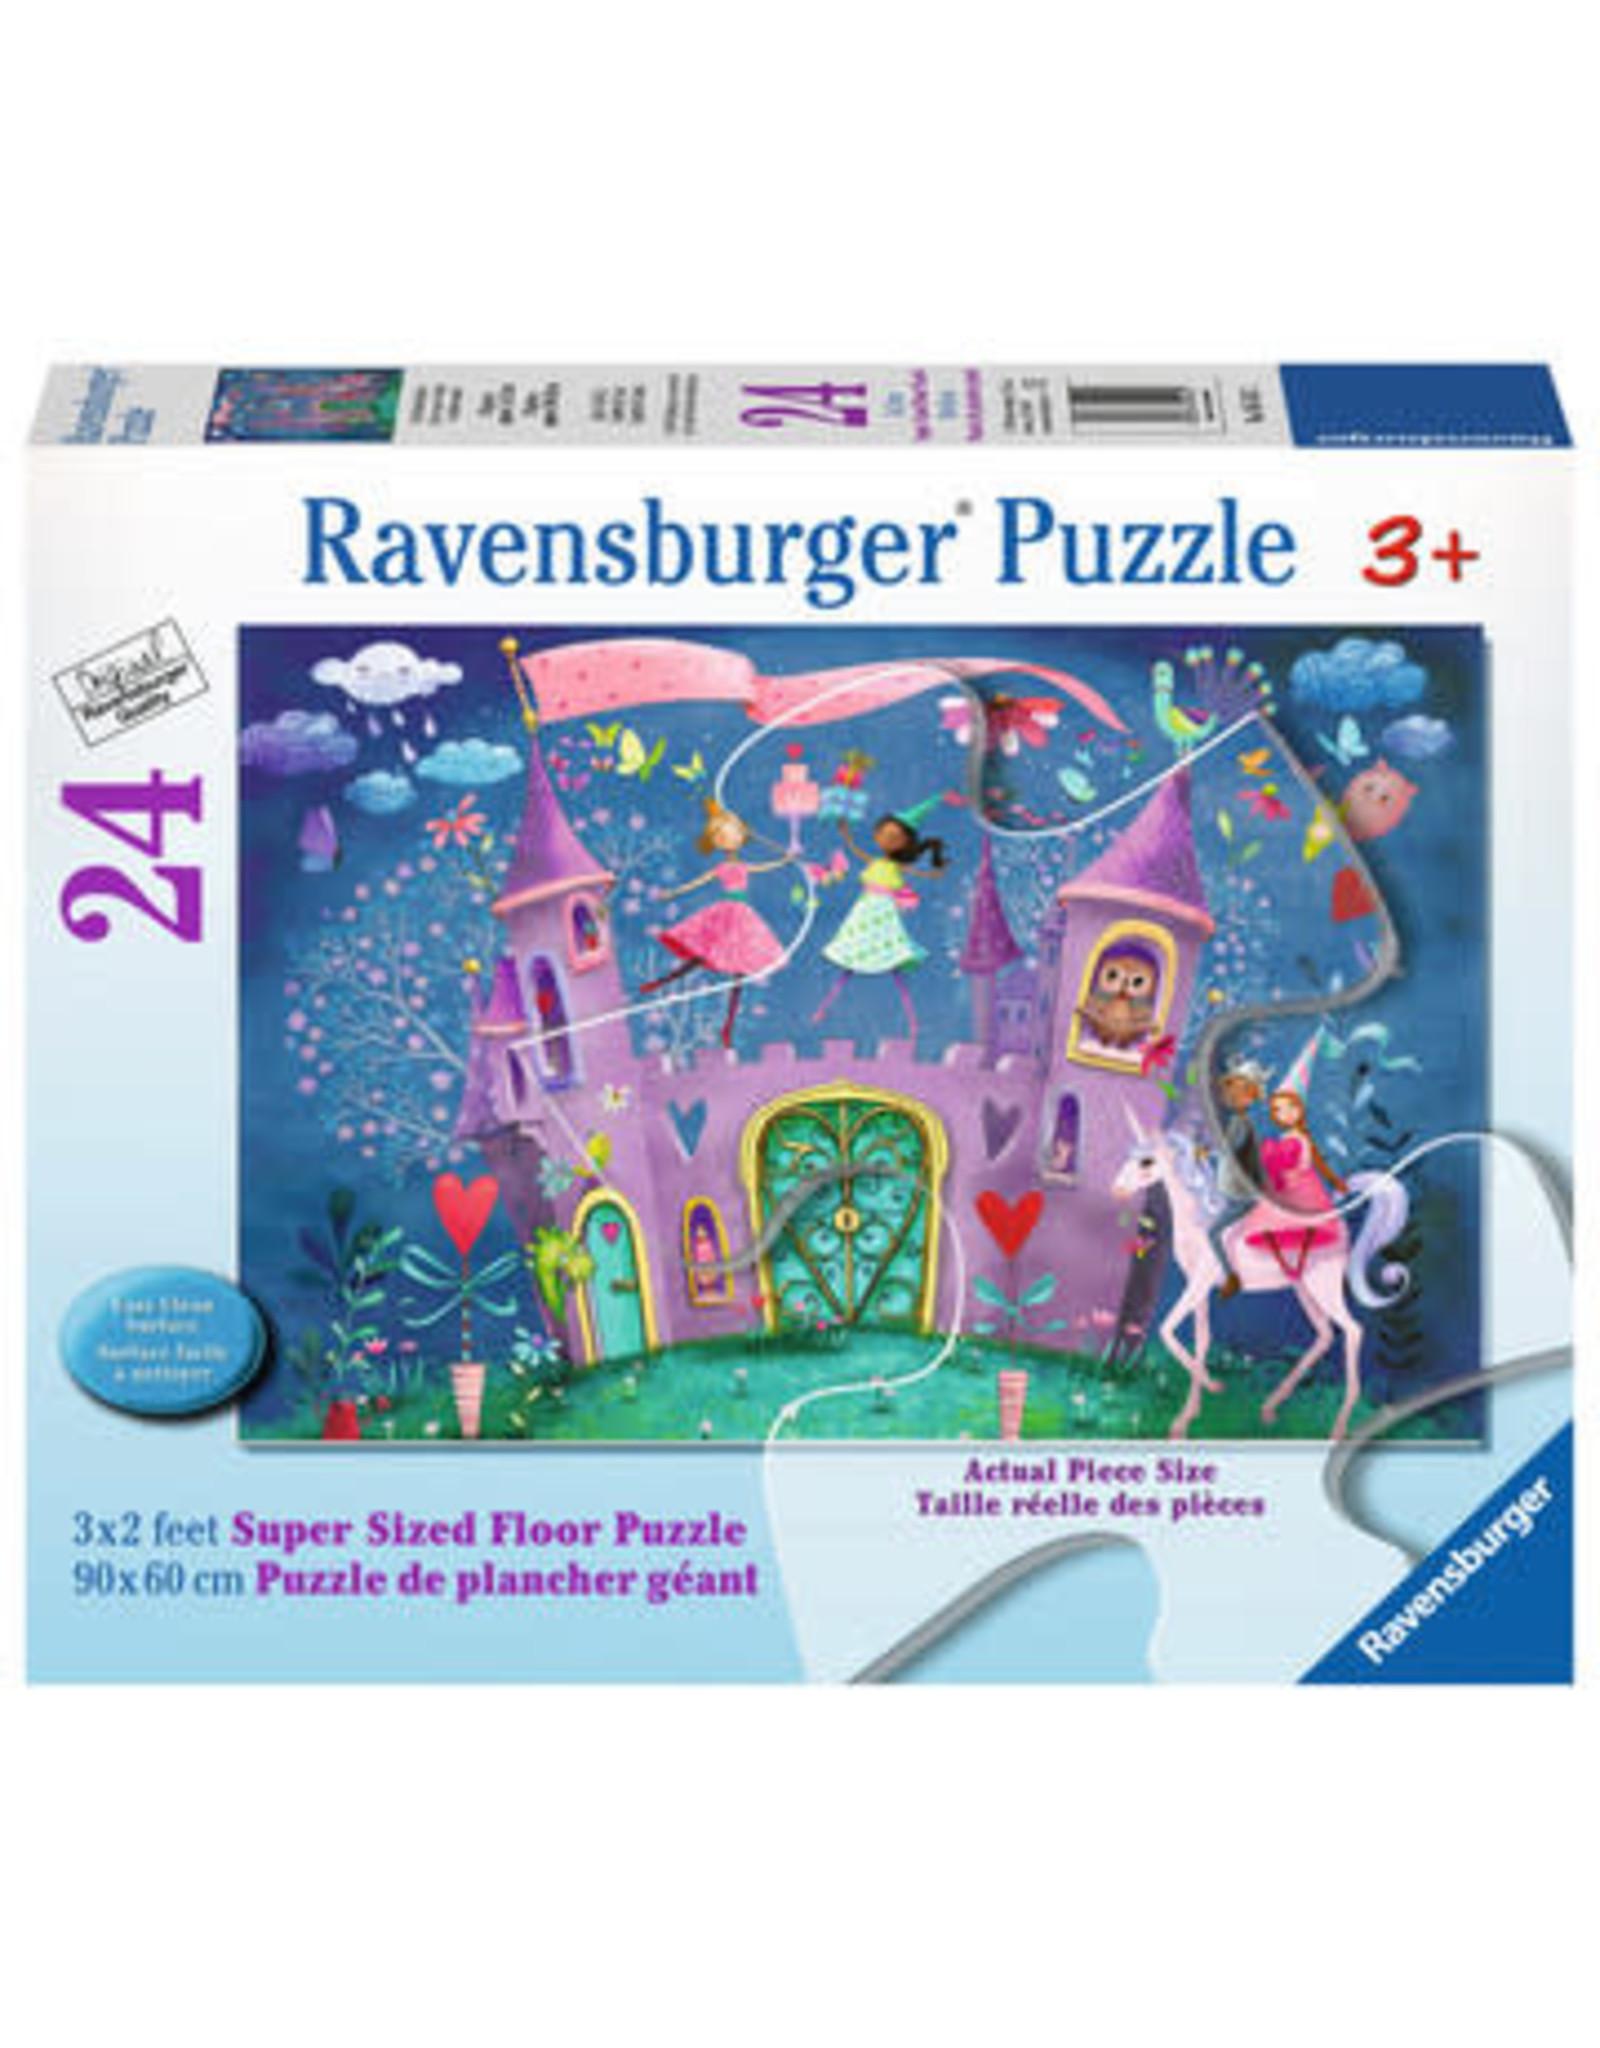 Ravensburger 24 pcs. Brilliant Birthday Floor Puzzle